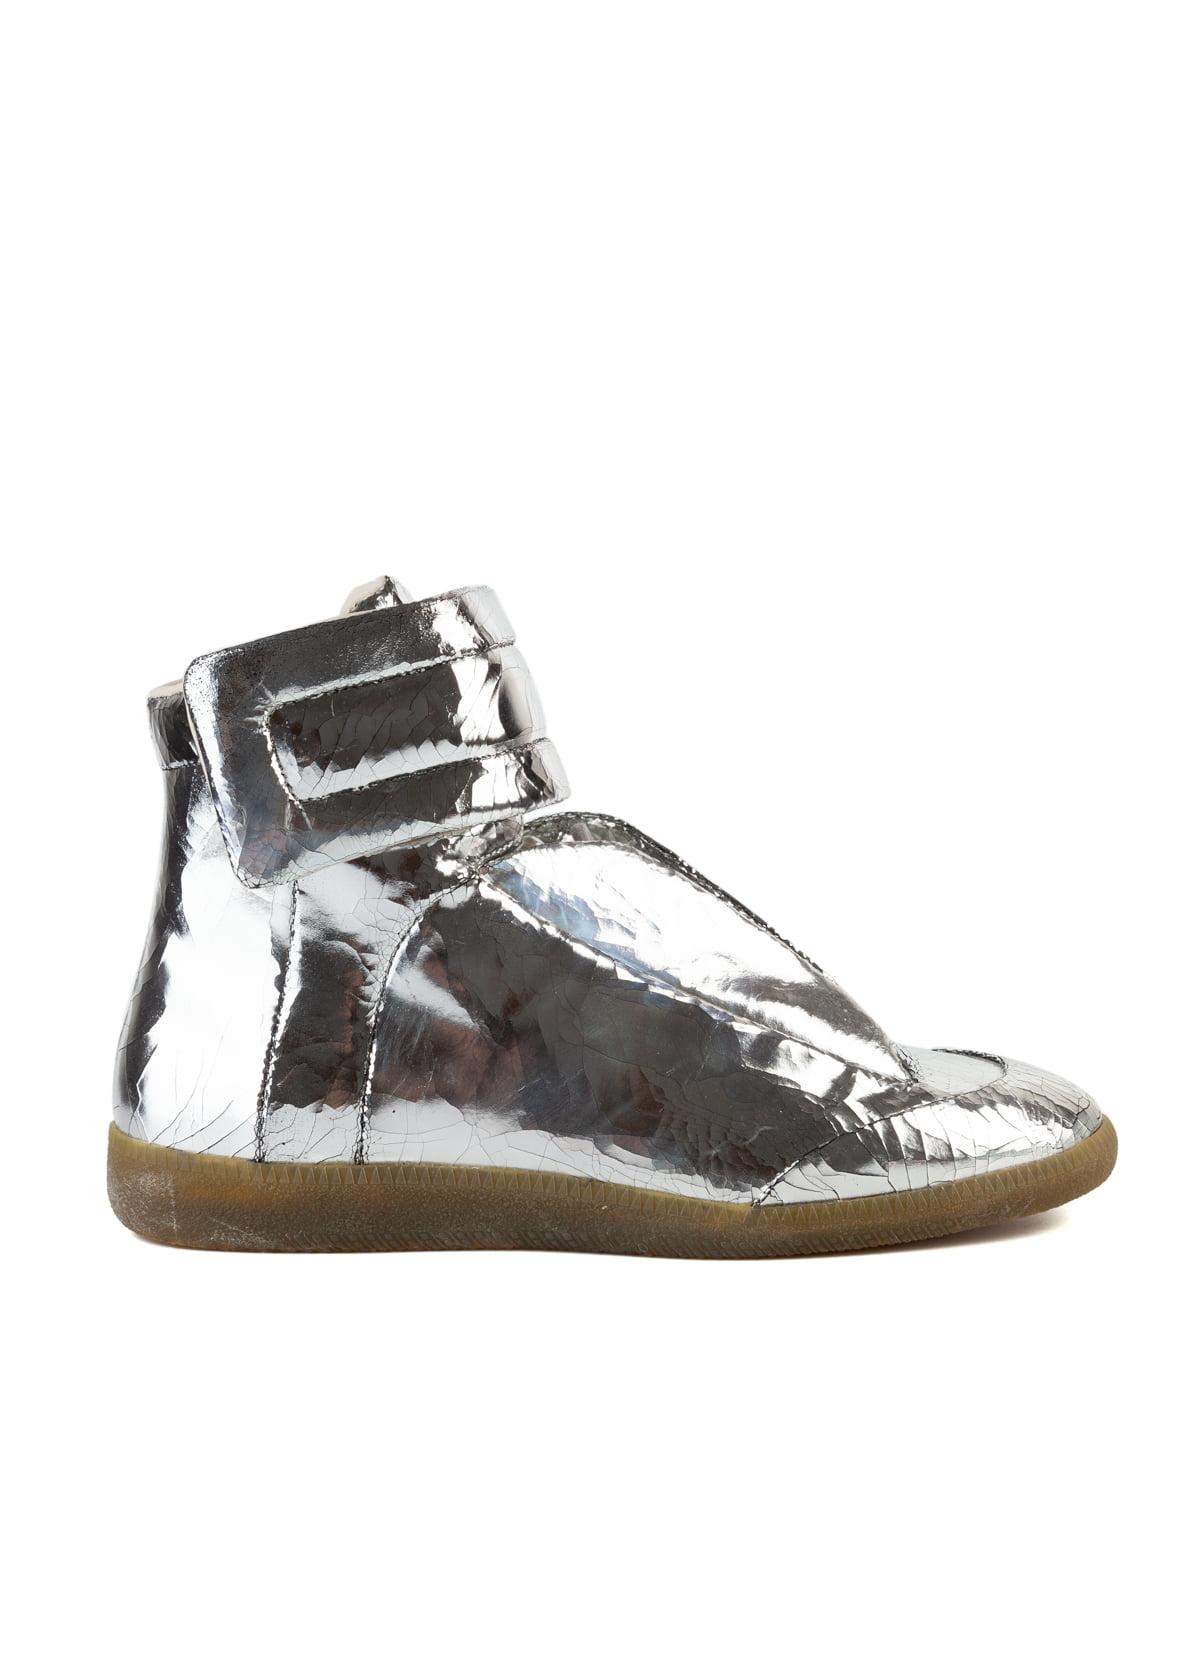 Maison Margiela Mens Silver Metallic